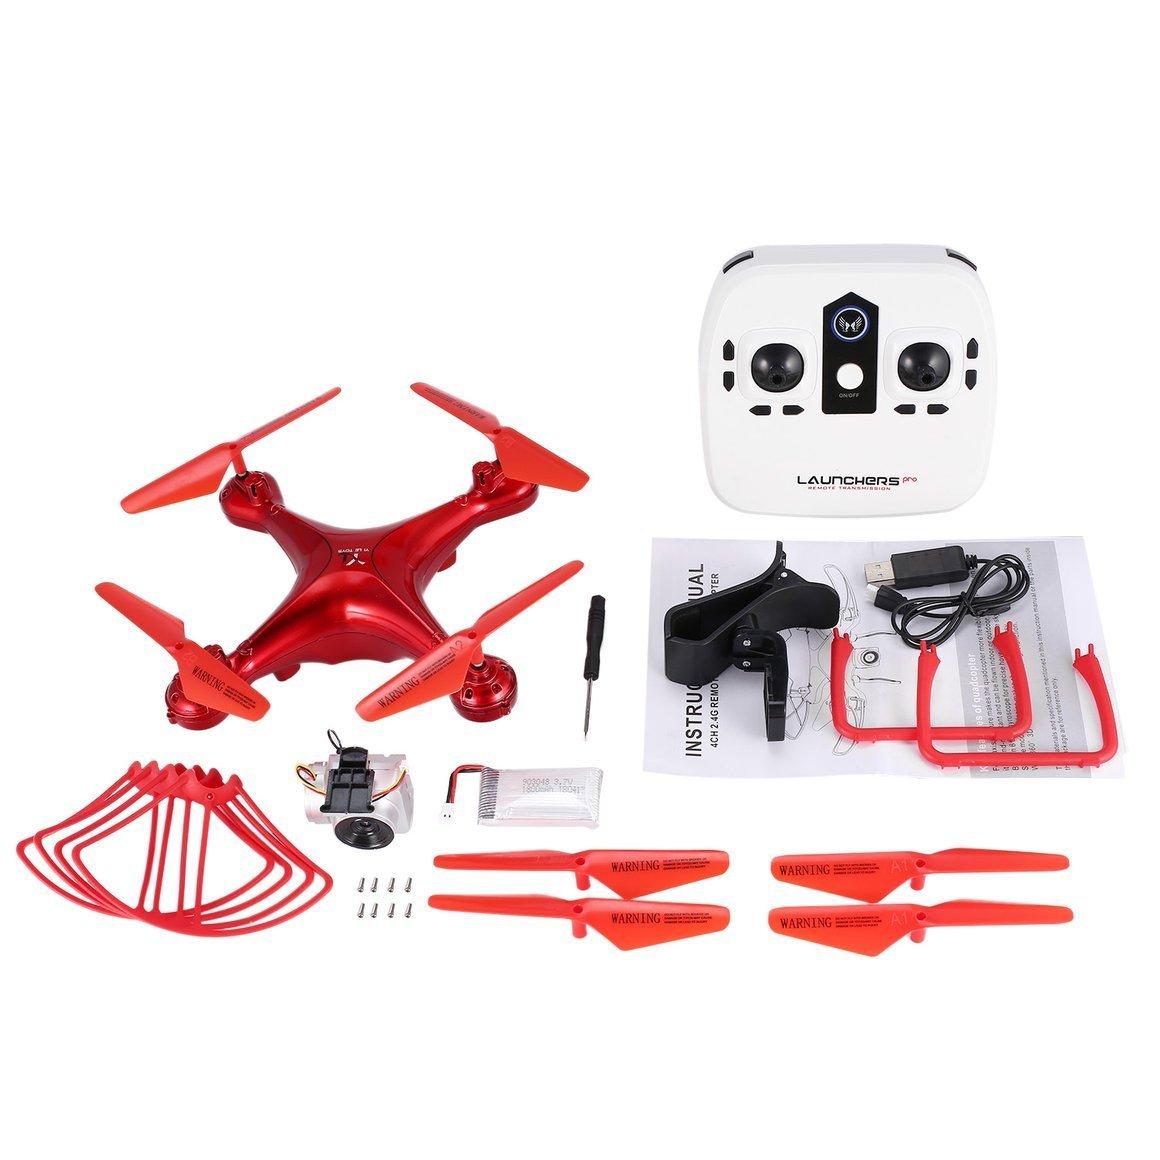 Funrunstore S28 RC Drone 2,4G Selfie Quadcopter Flugzeuge mit Wifi FPV Kamera Höhe Halten Auto Return Headless 3D Flip 18min Langen Flug (Farbe: Rot)